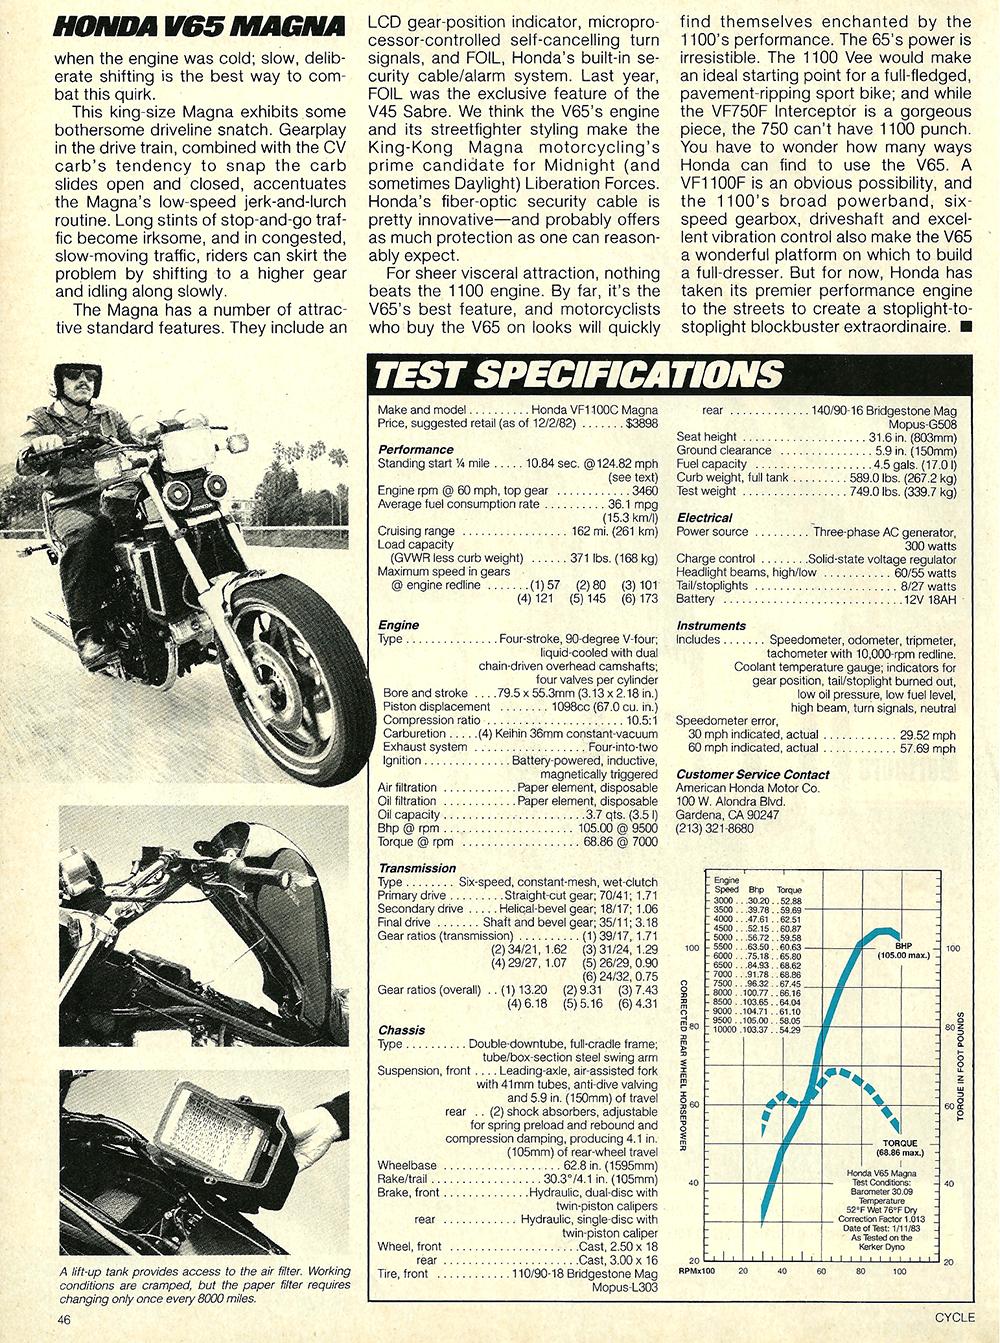 1983 Honda V65 Magna road test 8.jpg